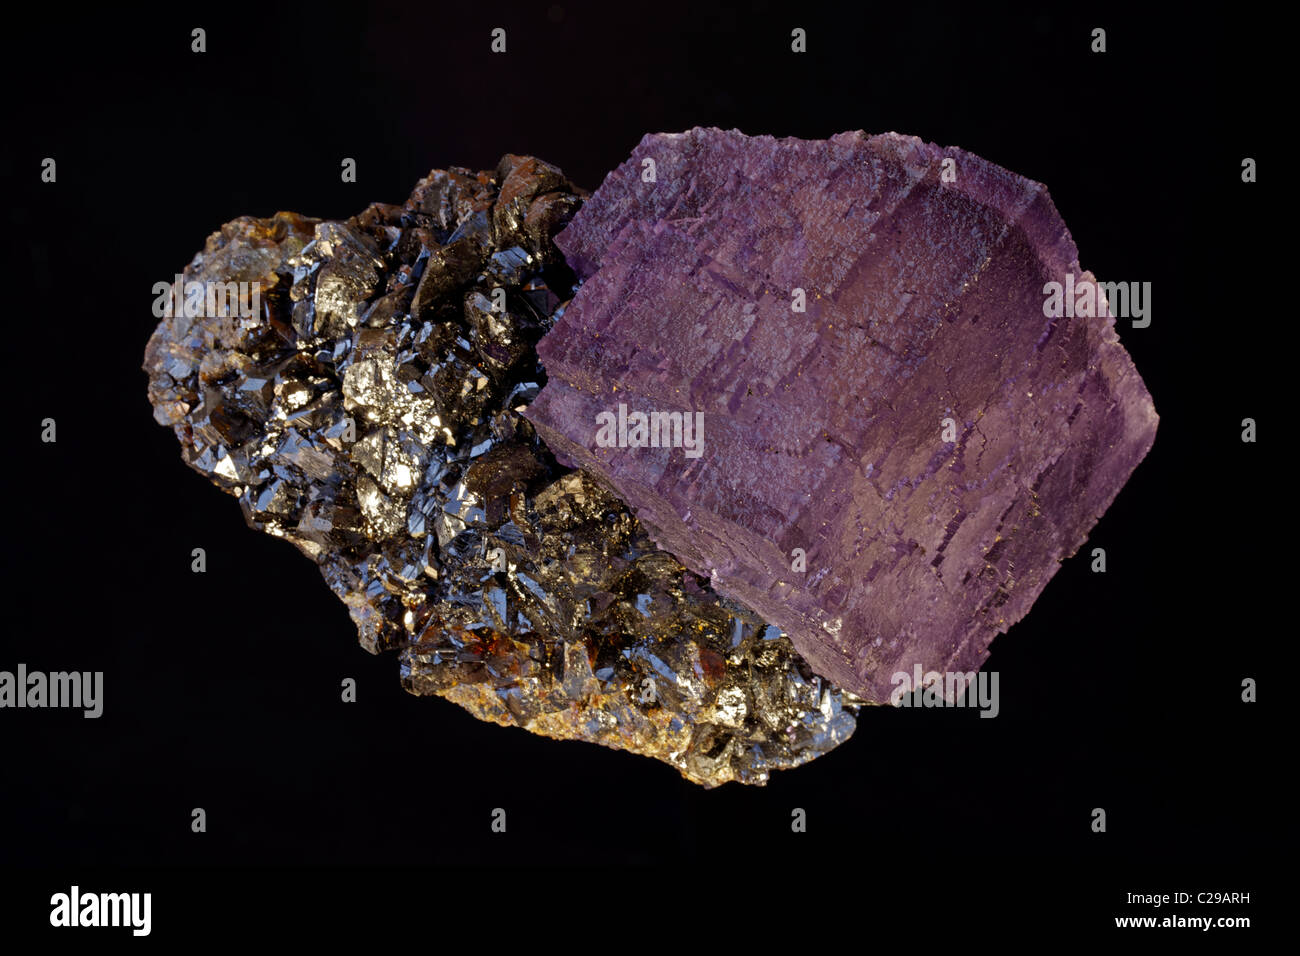 Fluorite (CaF2) (calcium fluoride) on Sphalerite (ZnS) (zinc sulfide) - Elmwood Mine - Smith County - Tennessee - Stock Image